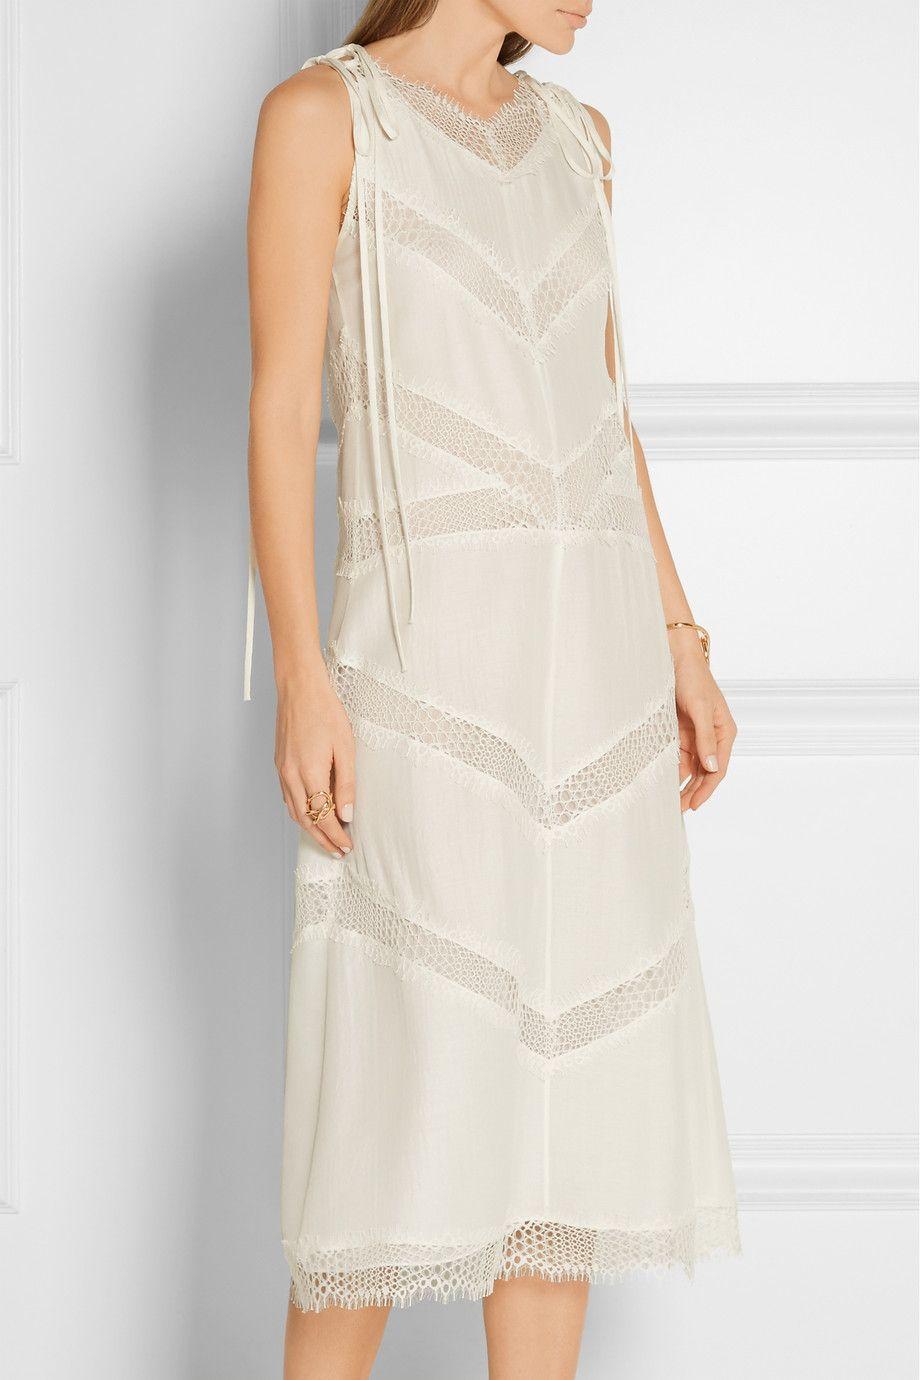 Wes Gordon Lace Paneled Silk And Wool Blend Midi Dress Net